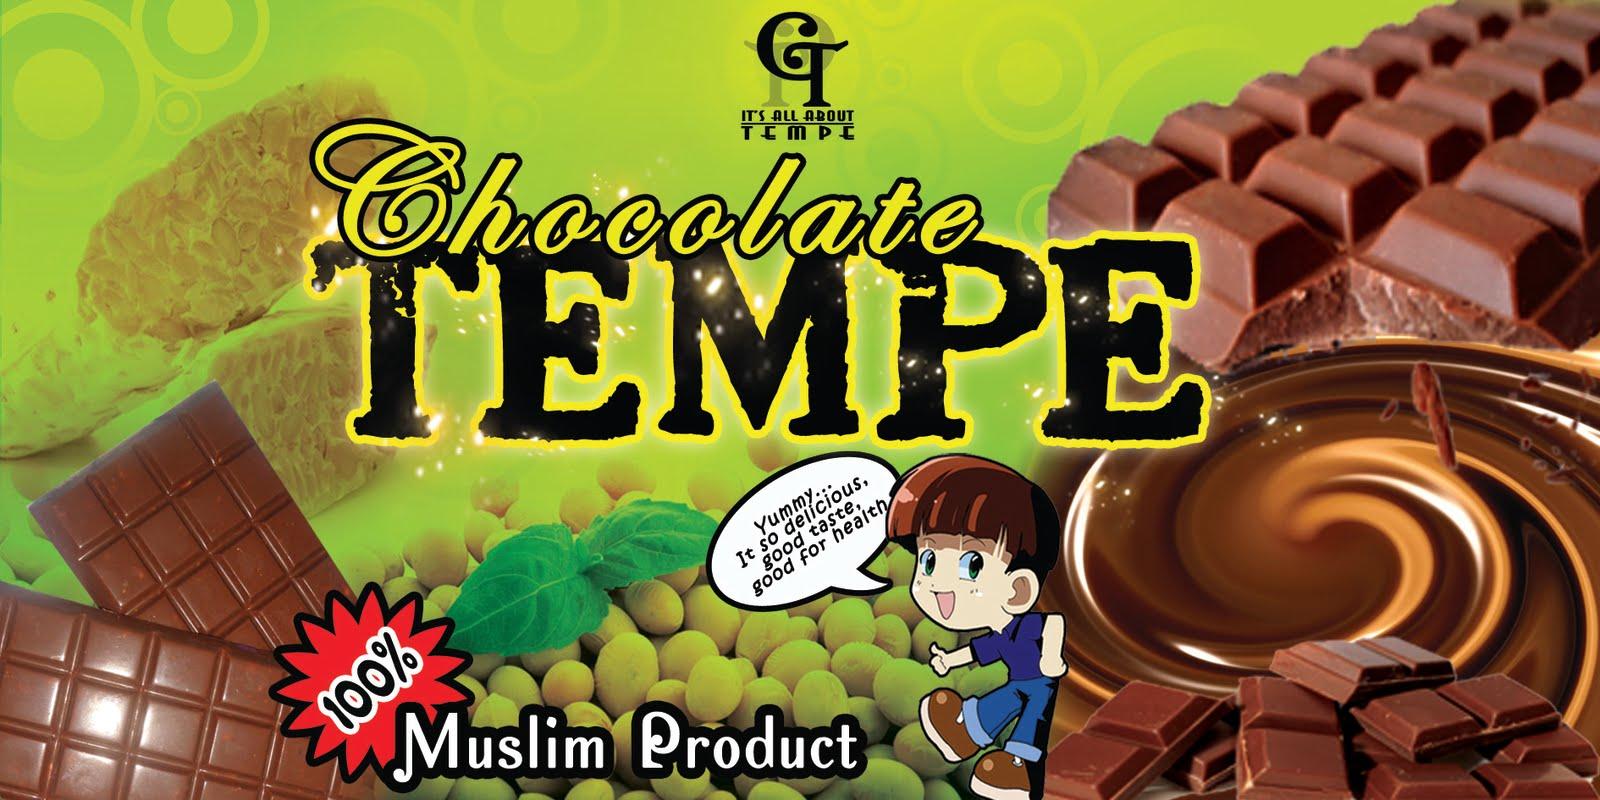 Chocolate Tempe®